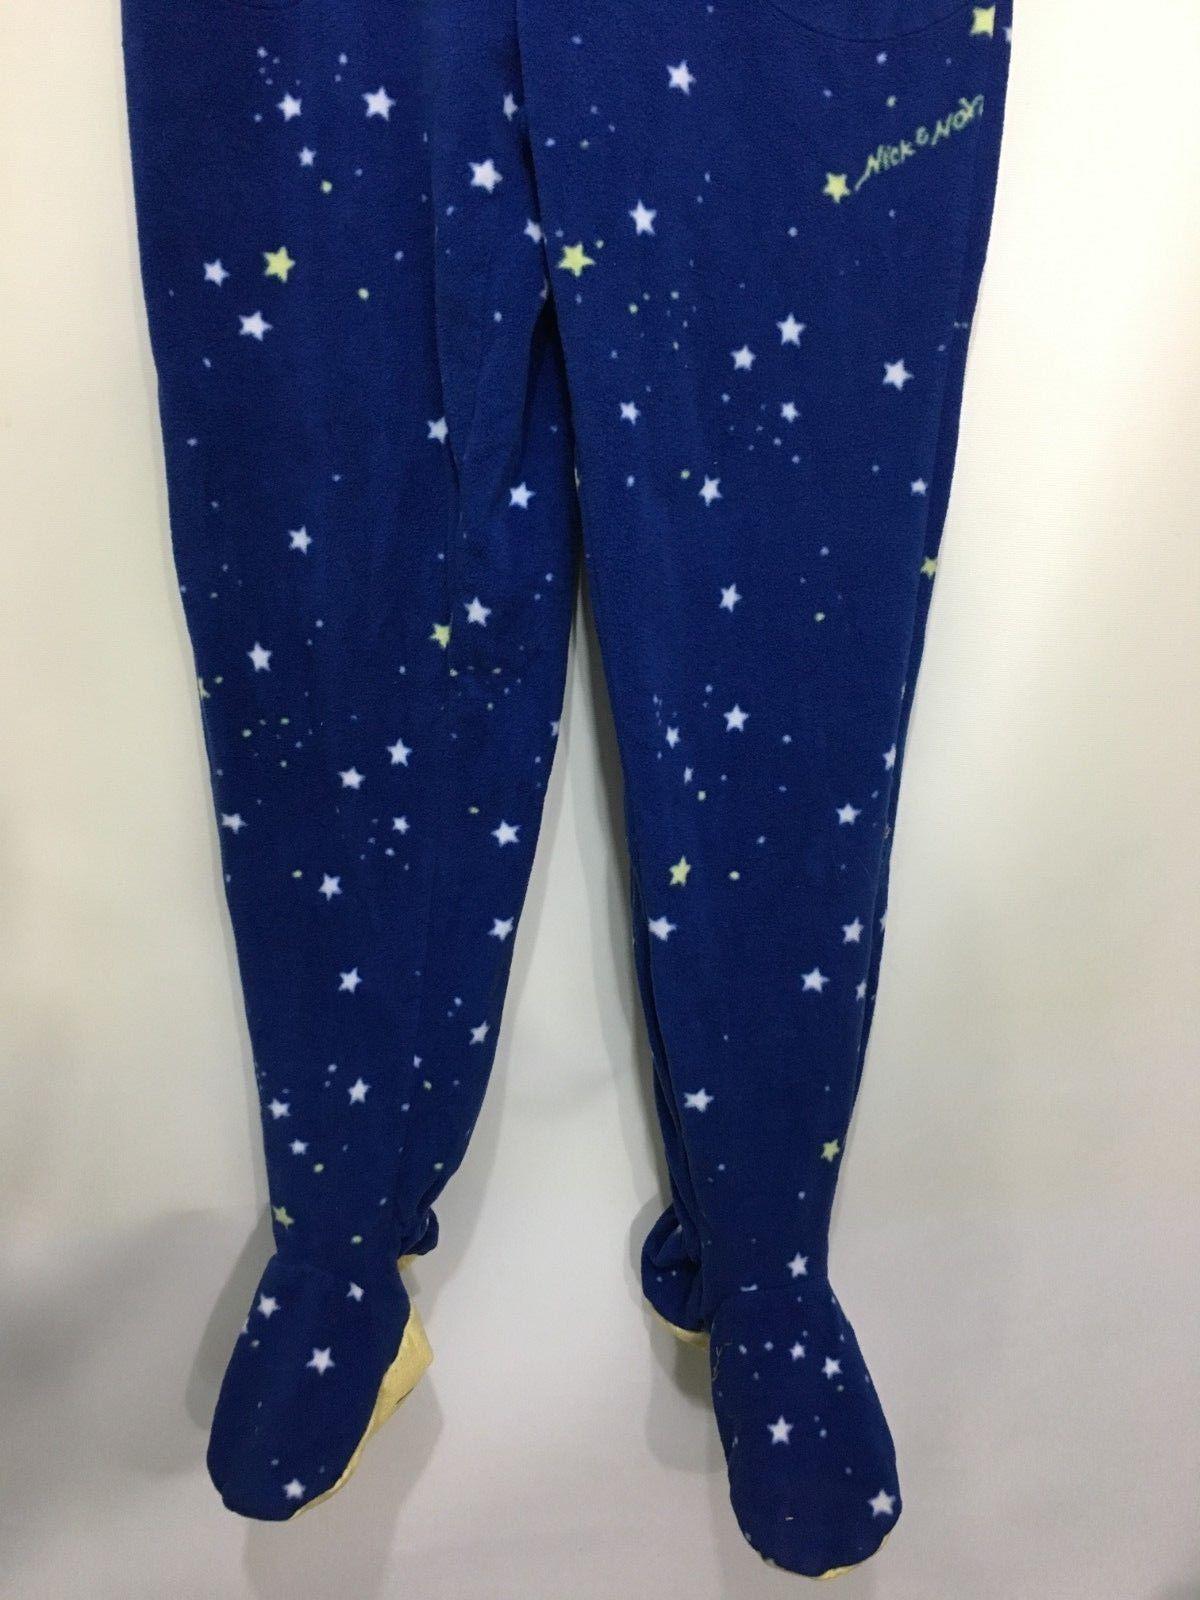 Nick & Nora Womens S Blue Stars One Piece Fleece Footed Pajamas Glow-In-the-Dark